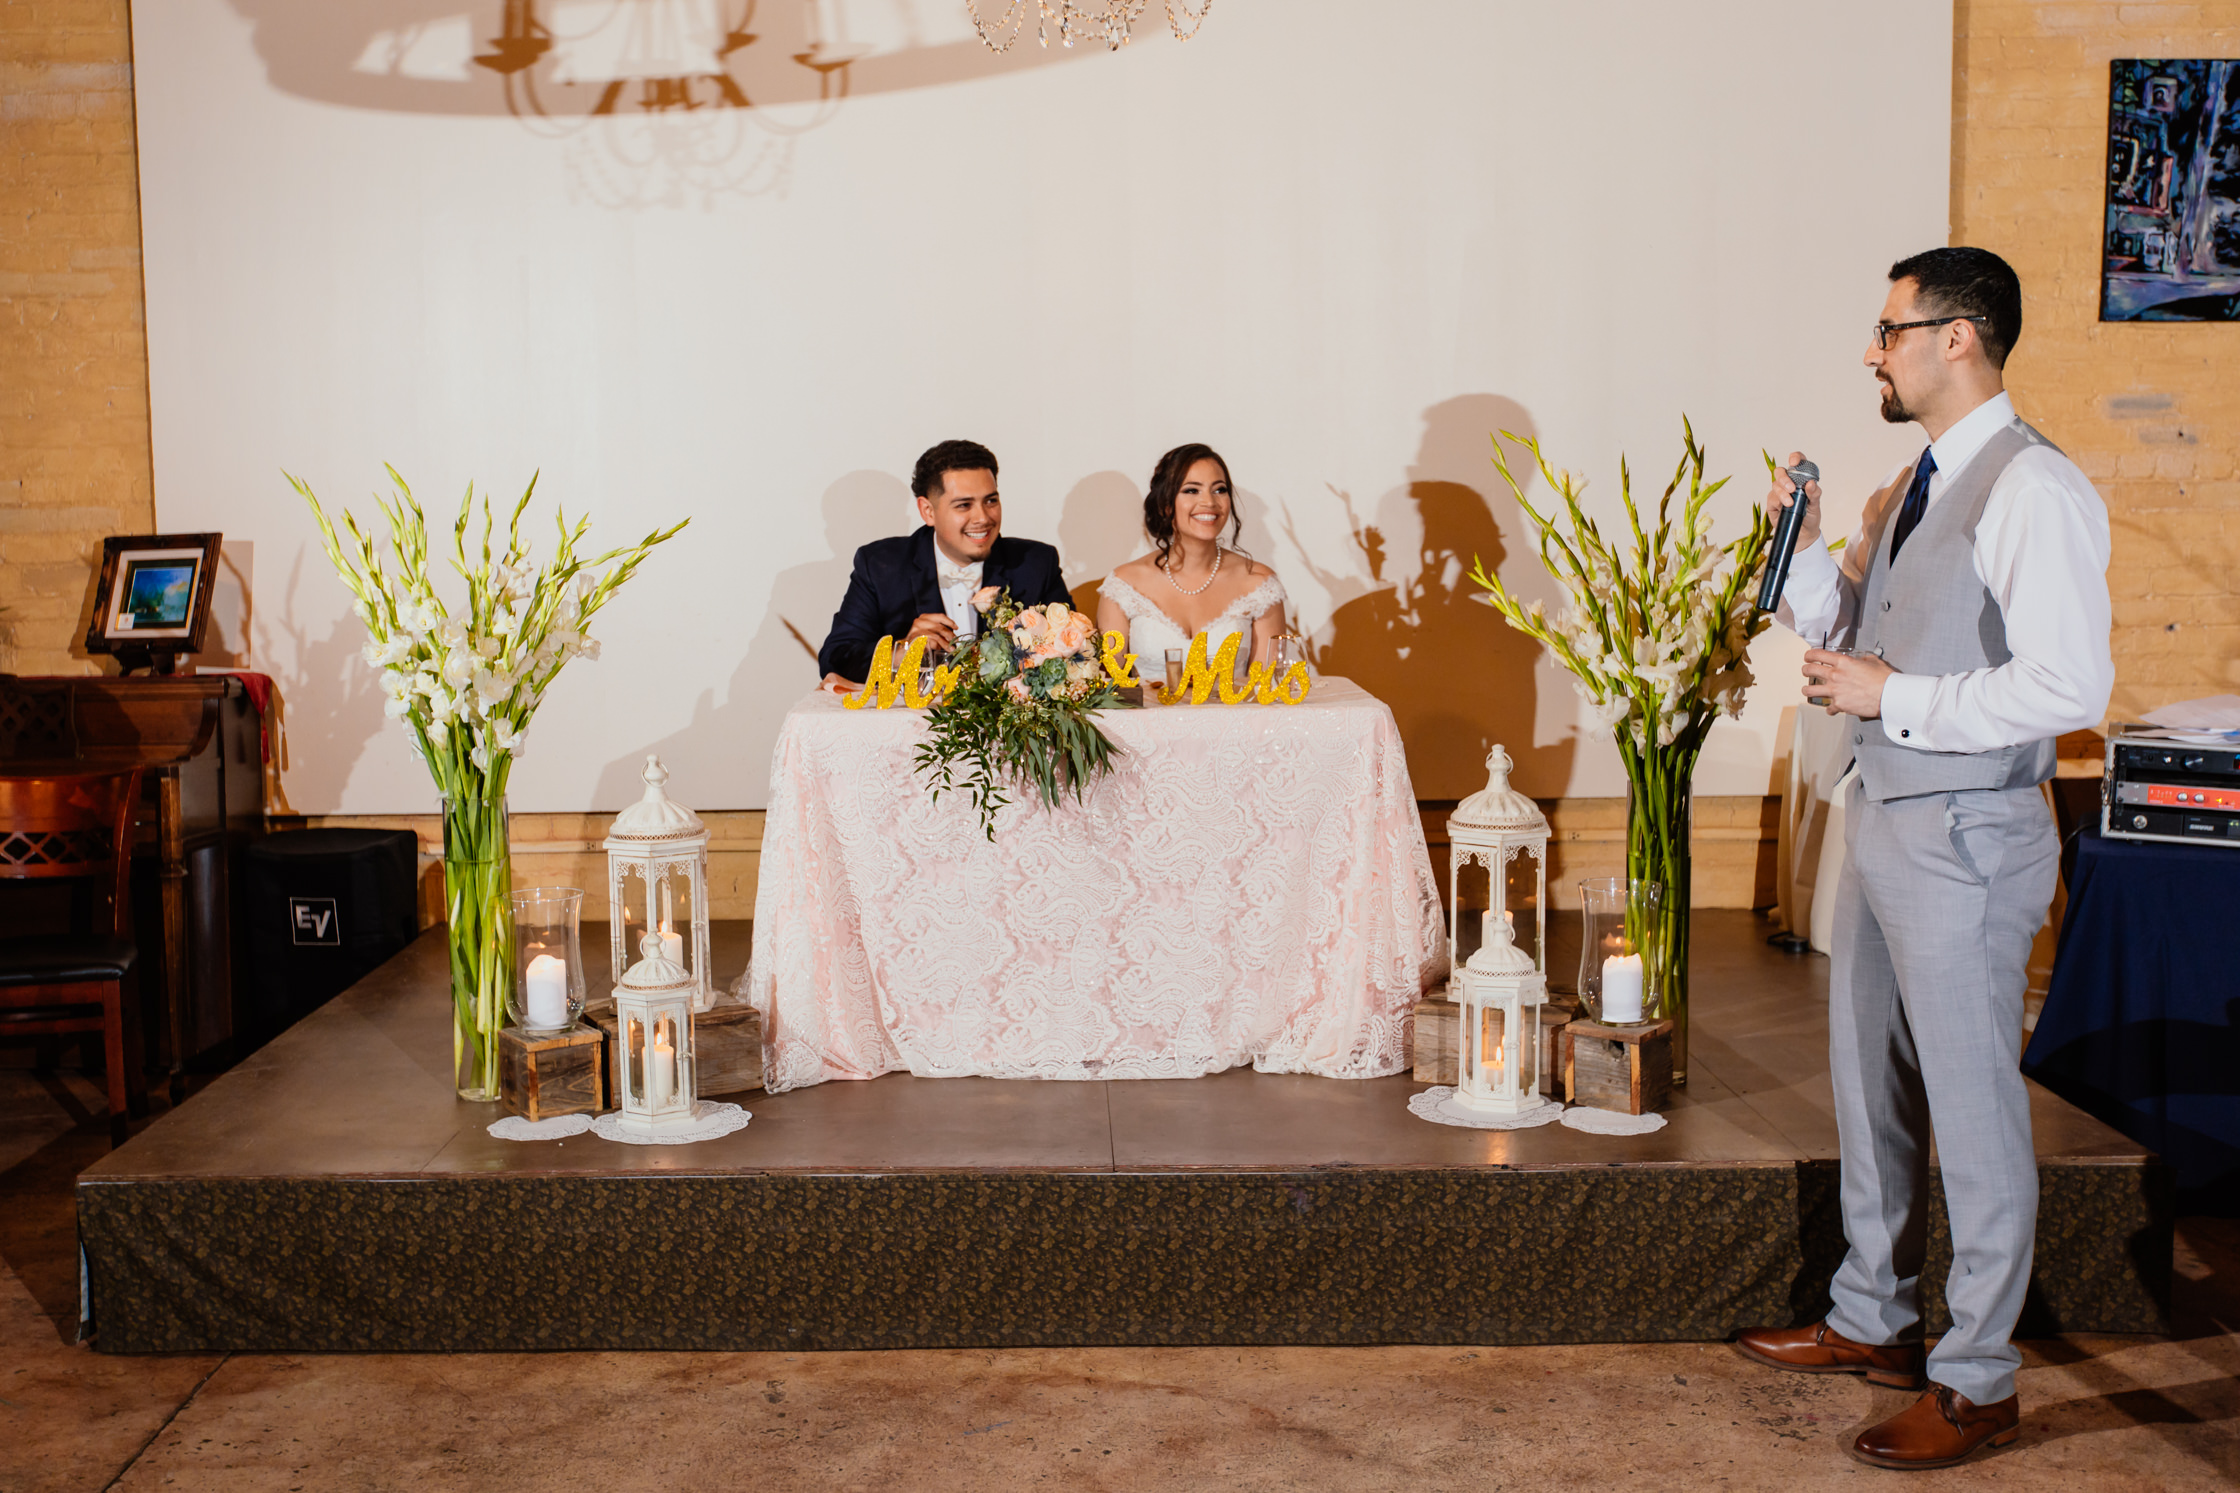 luis_joanna_wedding-84.jpg